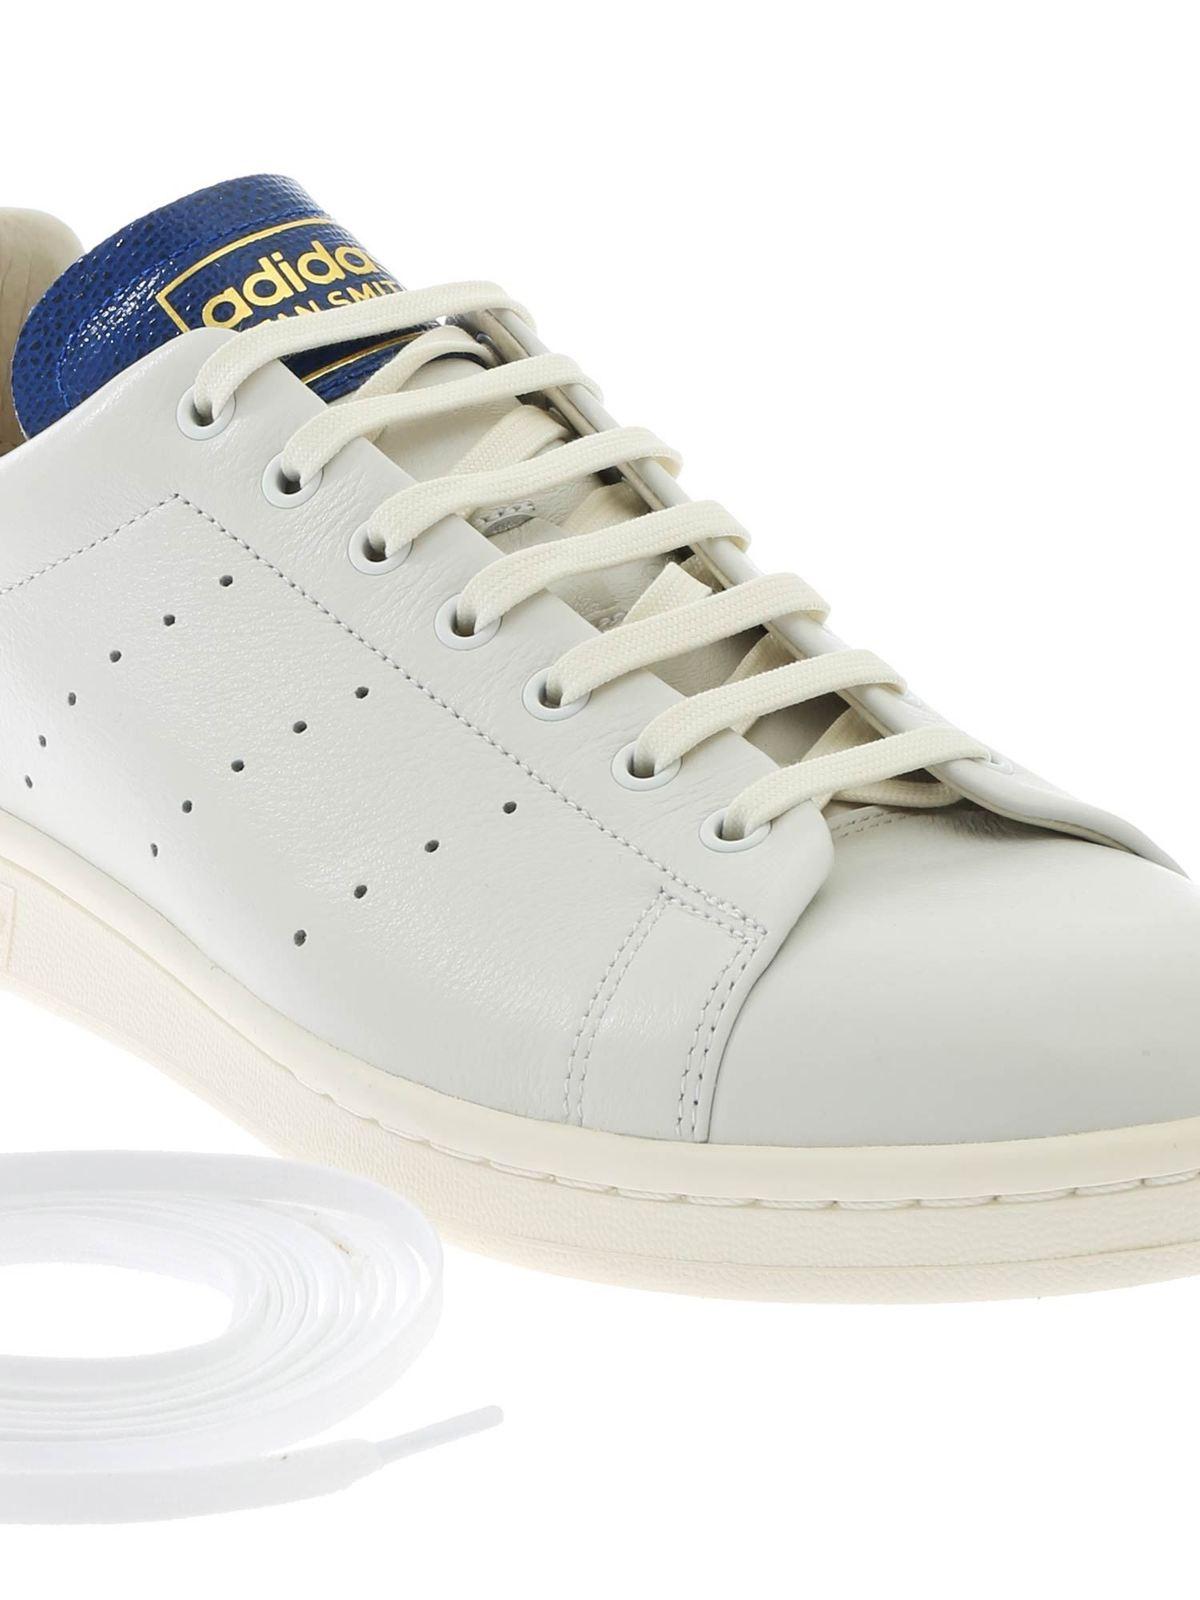 Adidas Originals - Stan Smith Bt